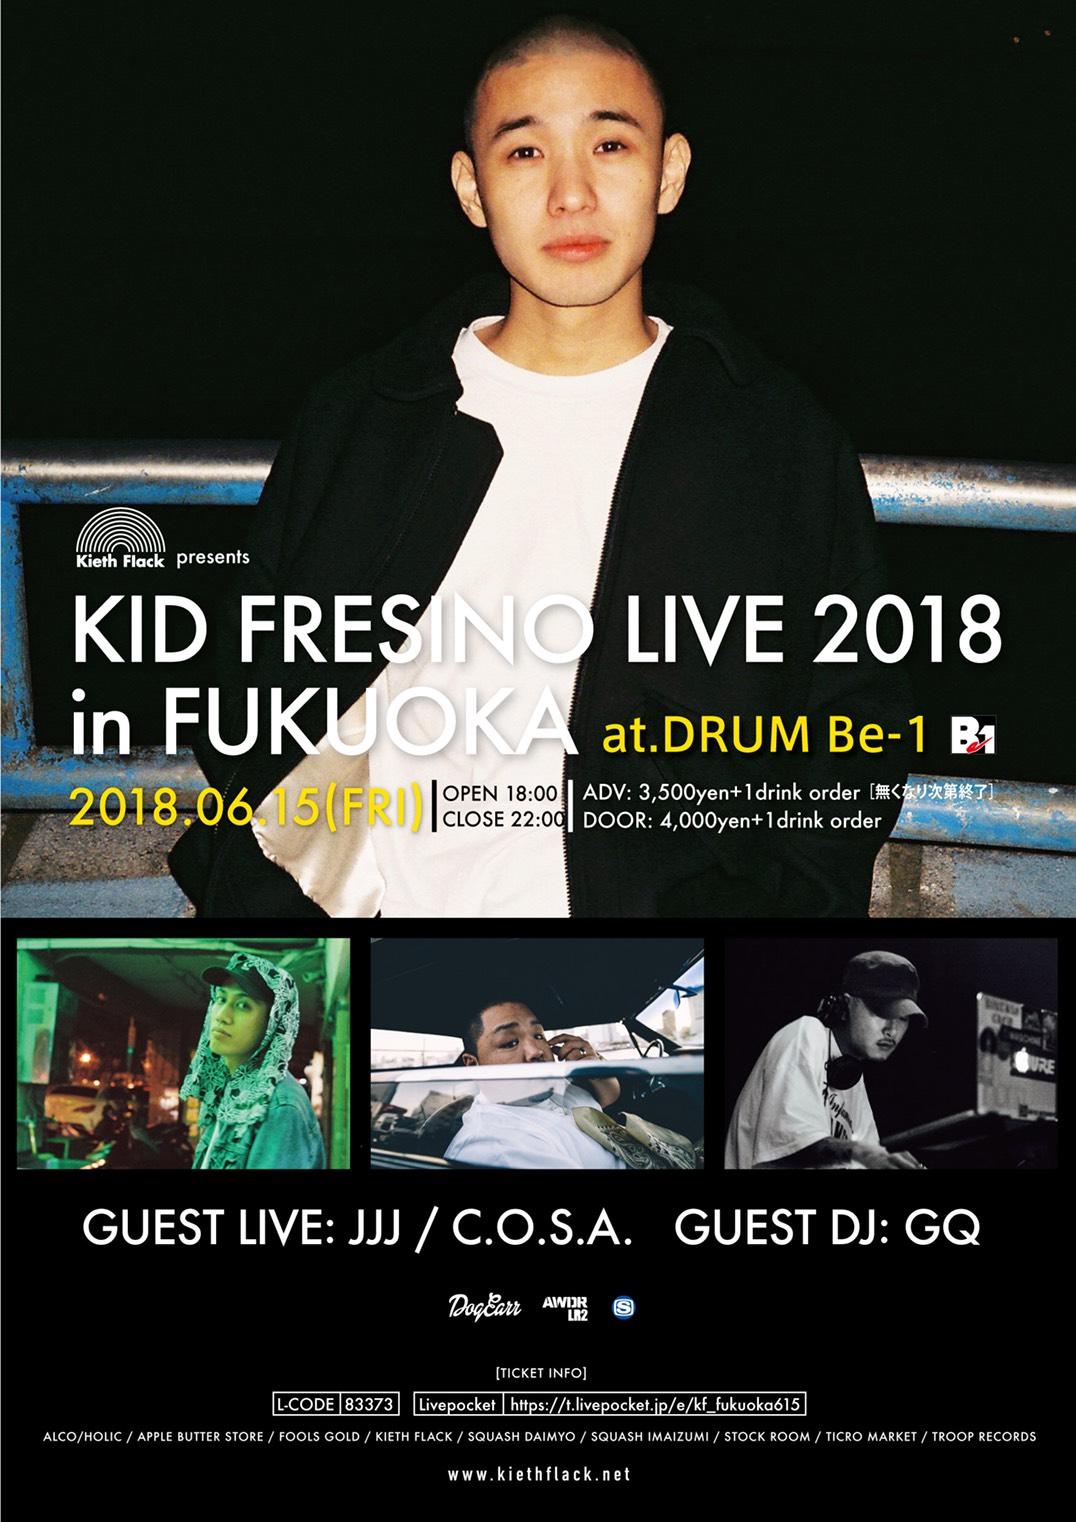 KID FRESINO LIVE 2018 in FUKUOKA